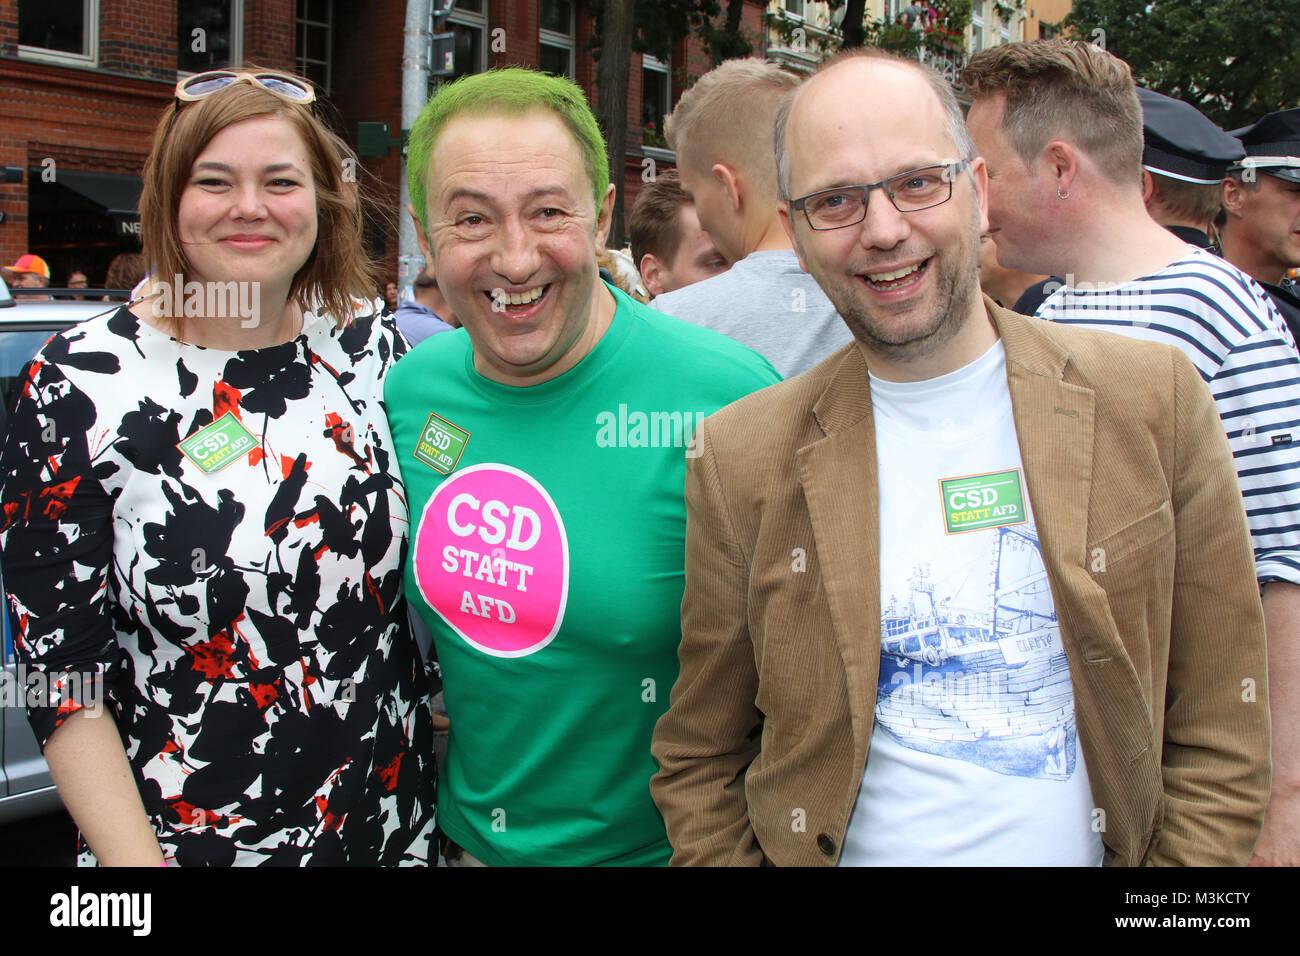 Katharina Fegebank, Farid Müller, Till Steffen, Start des CSD (Christopher Street Day) Umzuges, Lange Reihe Hamburg,Stockfoto